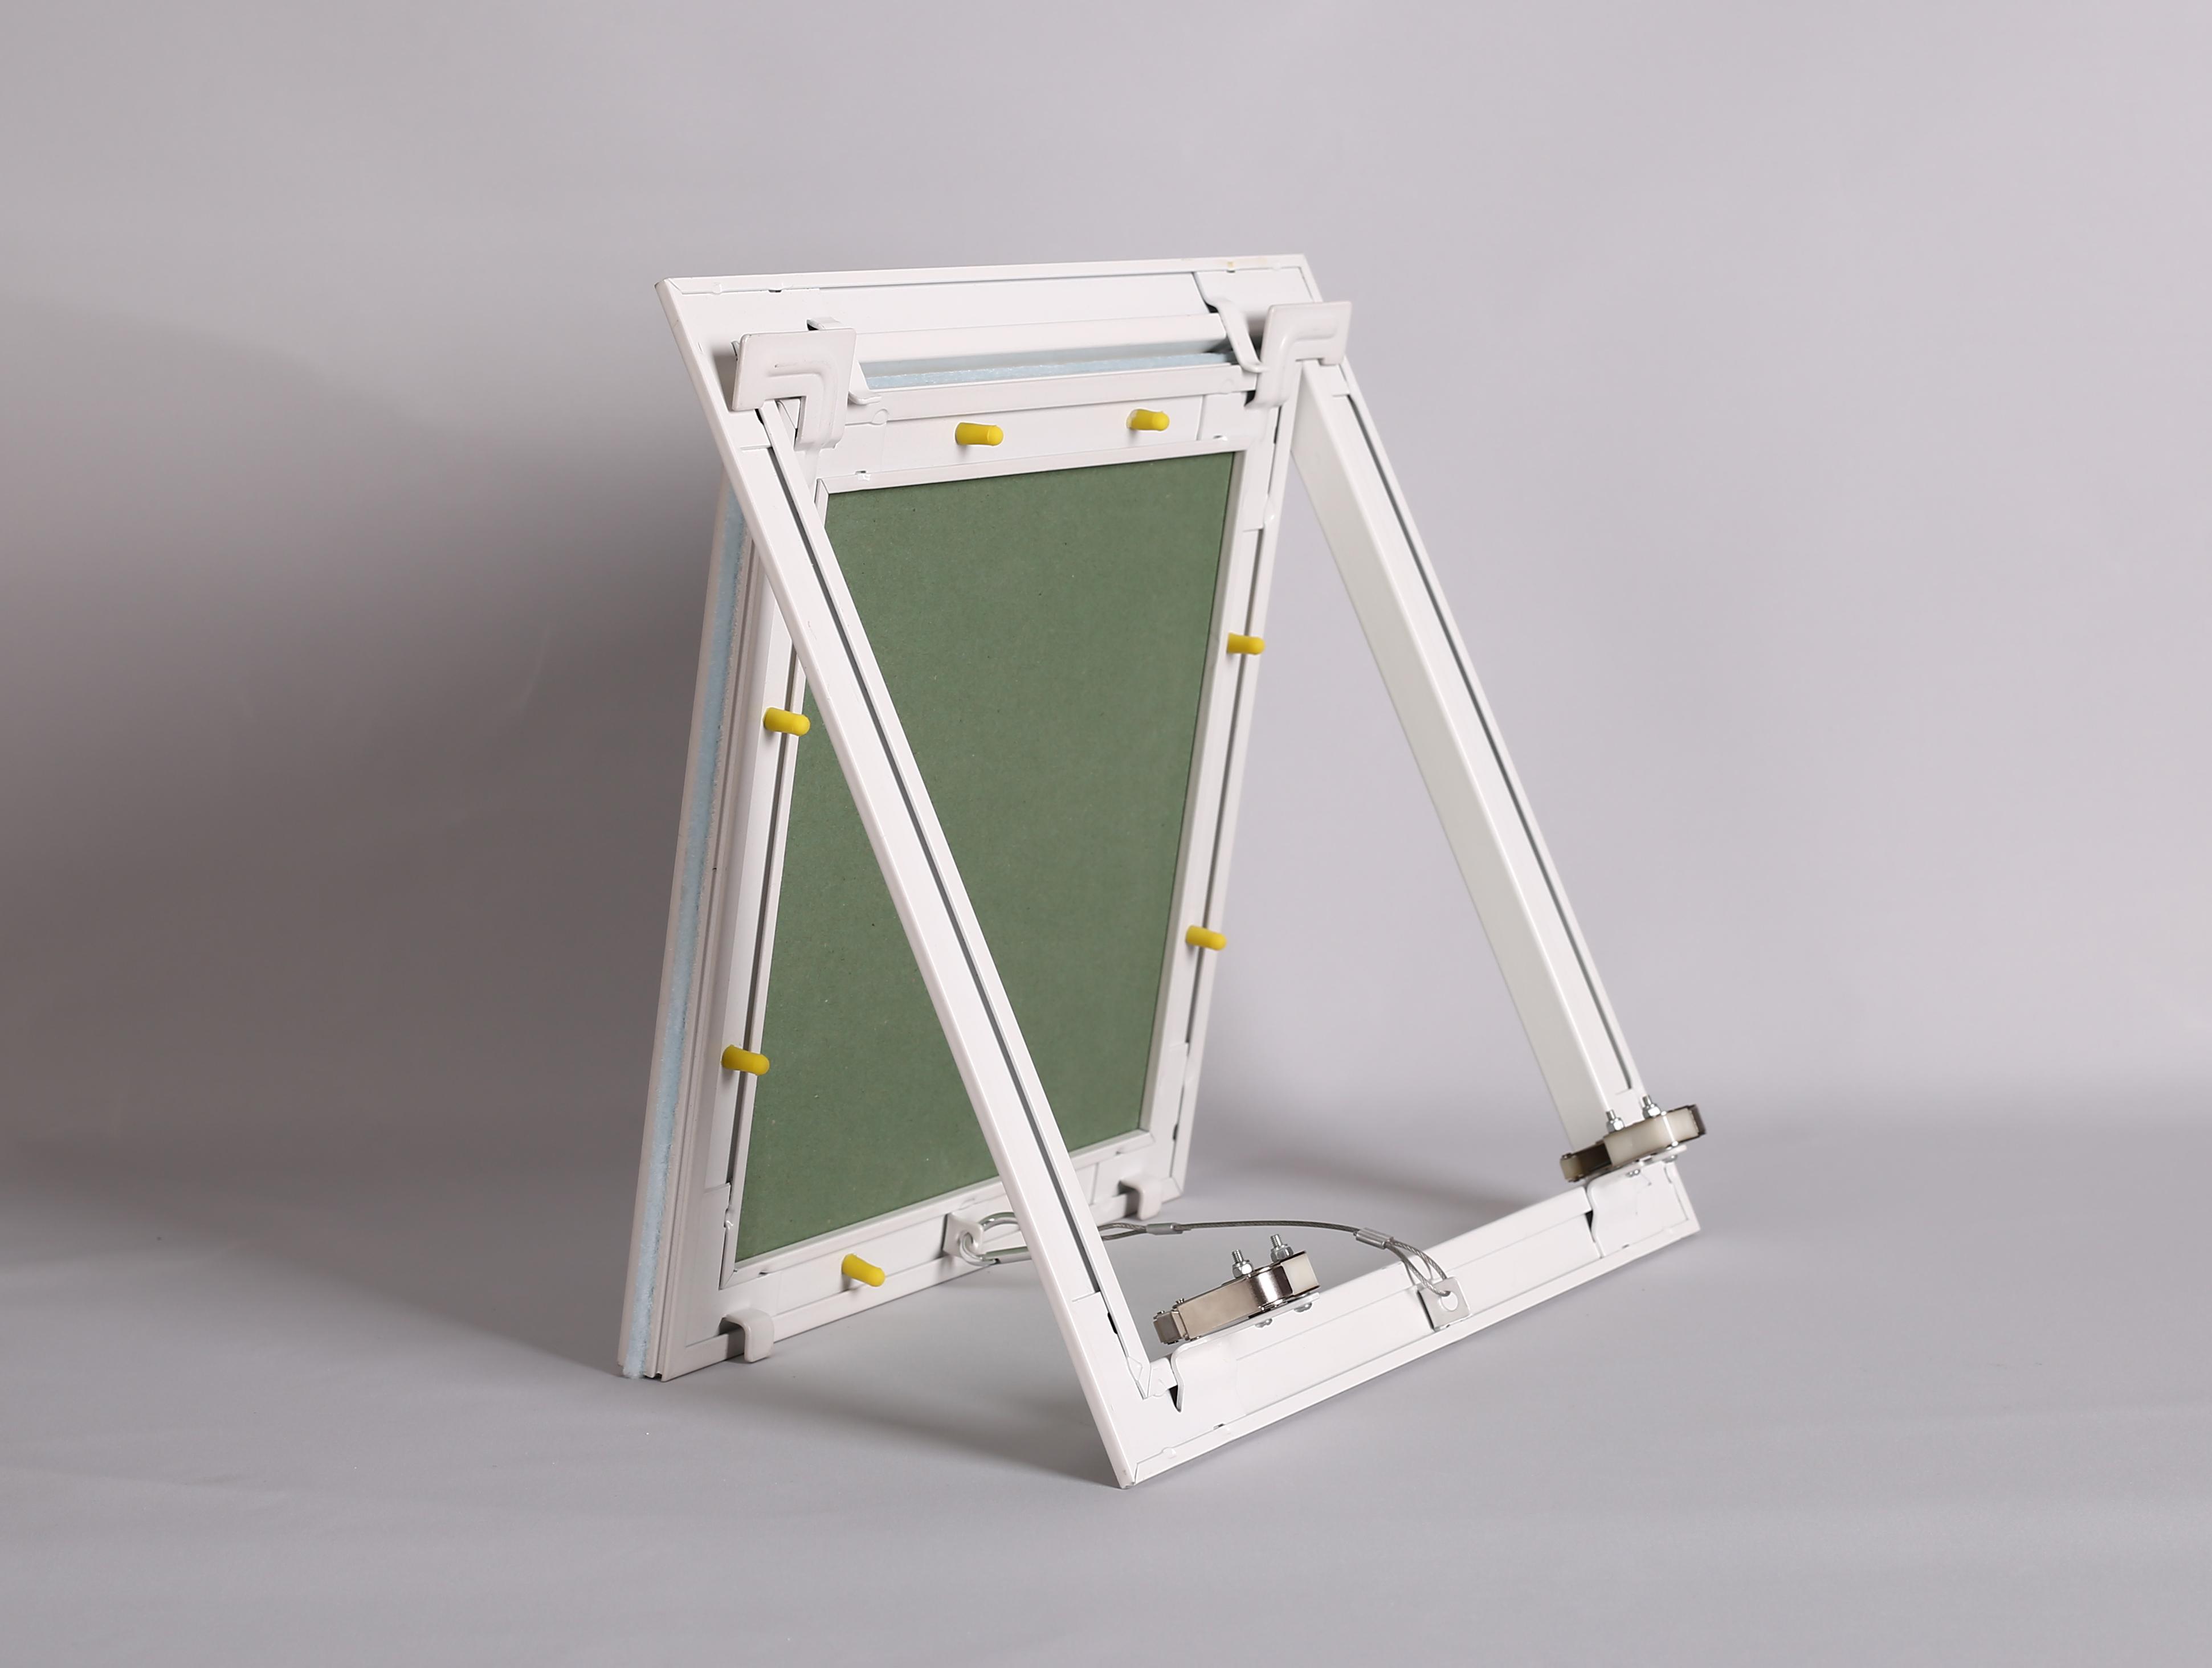 Gypsum ceiling  Trap Door / Access panel